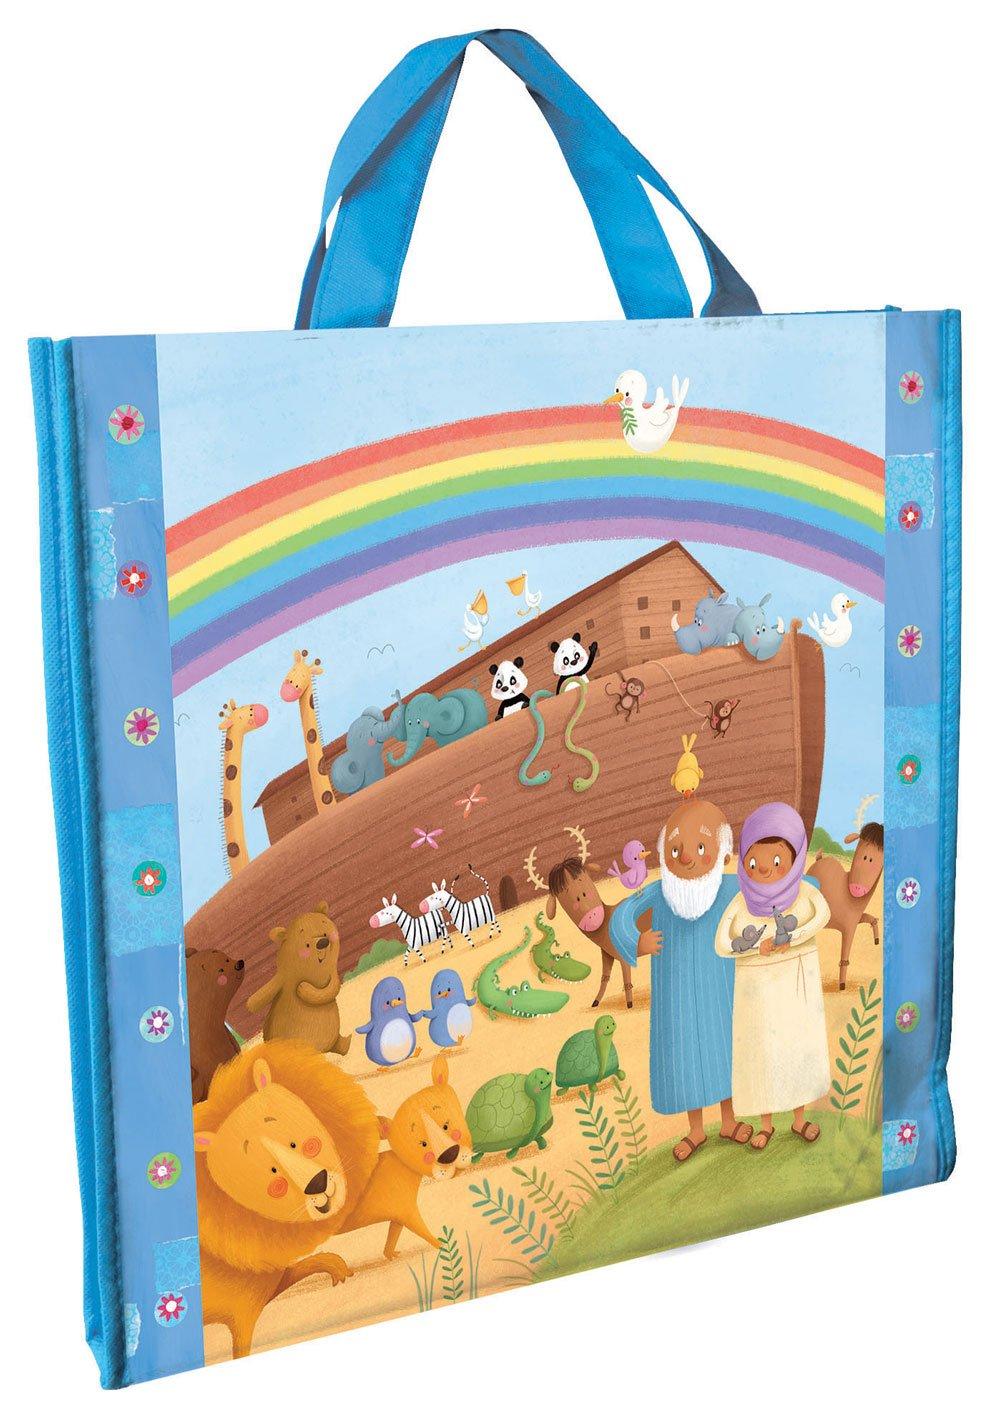 Bible Stories in Fabric Bag PDF